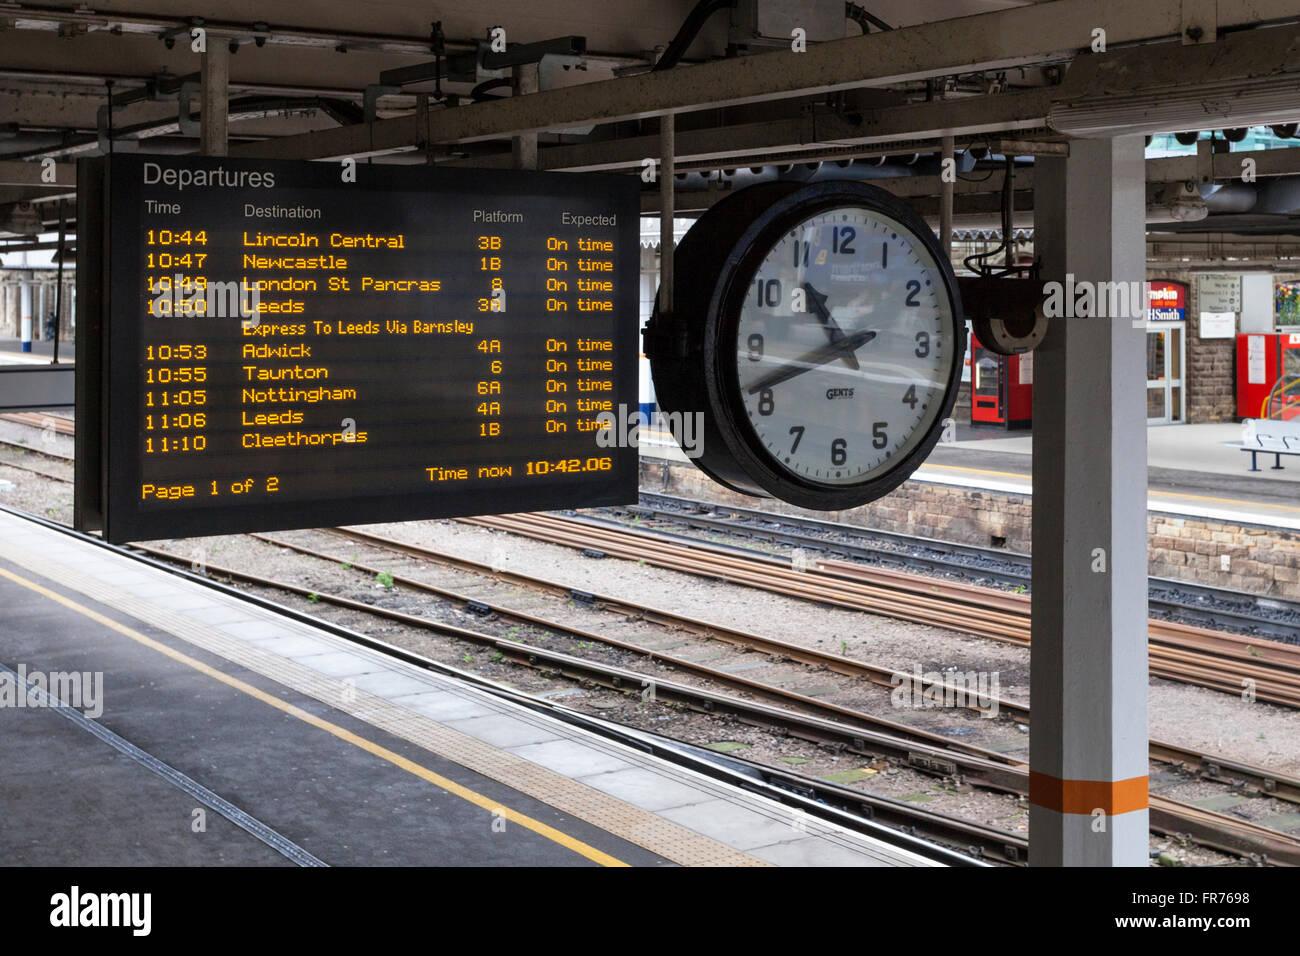 departure board station clock and platform at sheffield railway stock photo 100347556 alamy. Black Bedroom Furniture Sets. Home Design Ideas